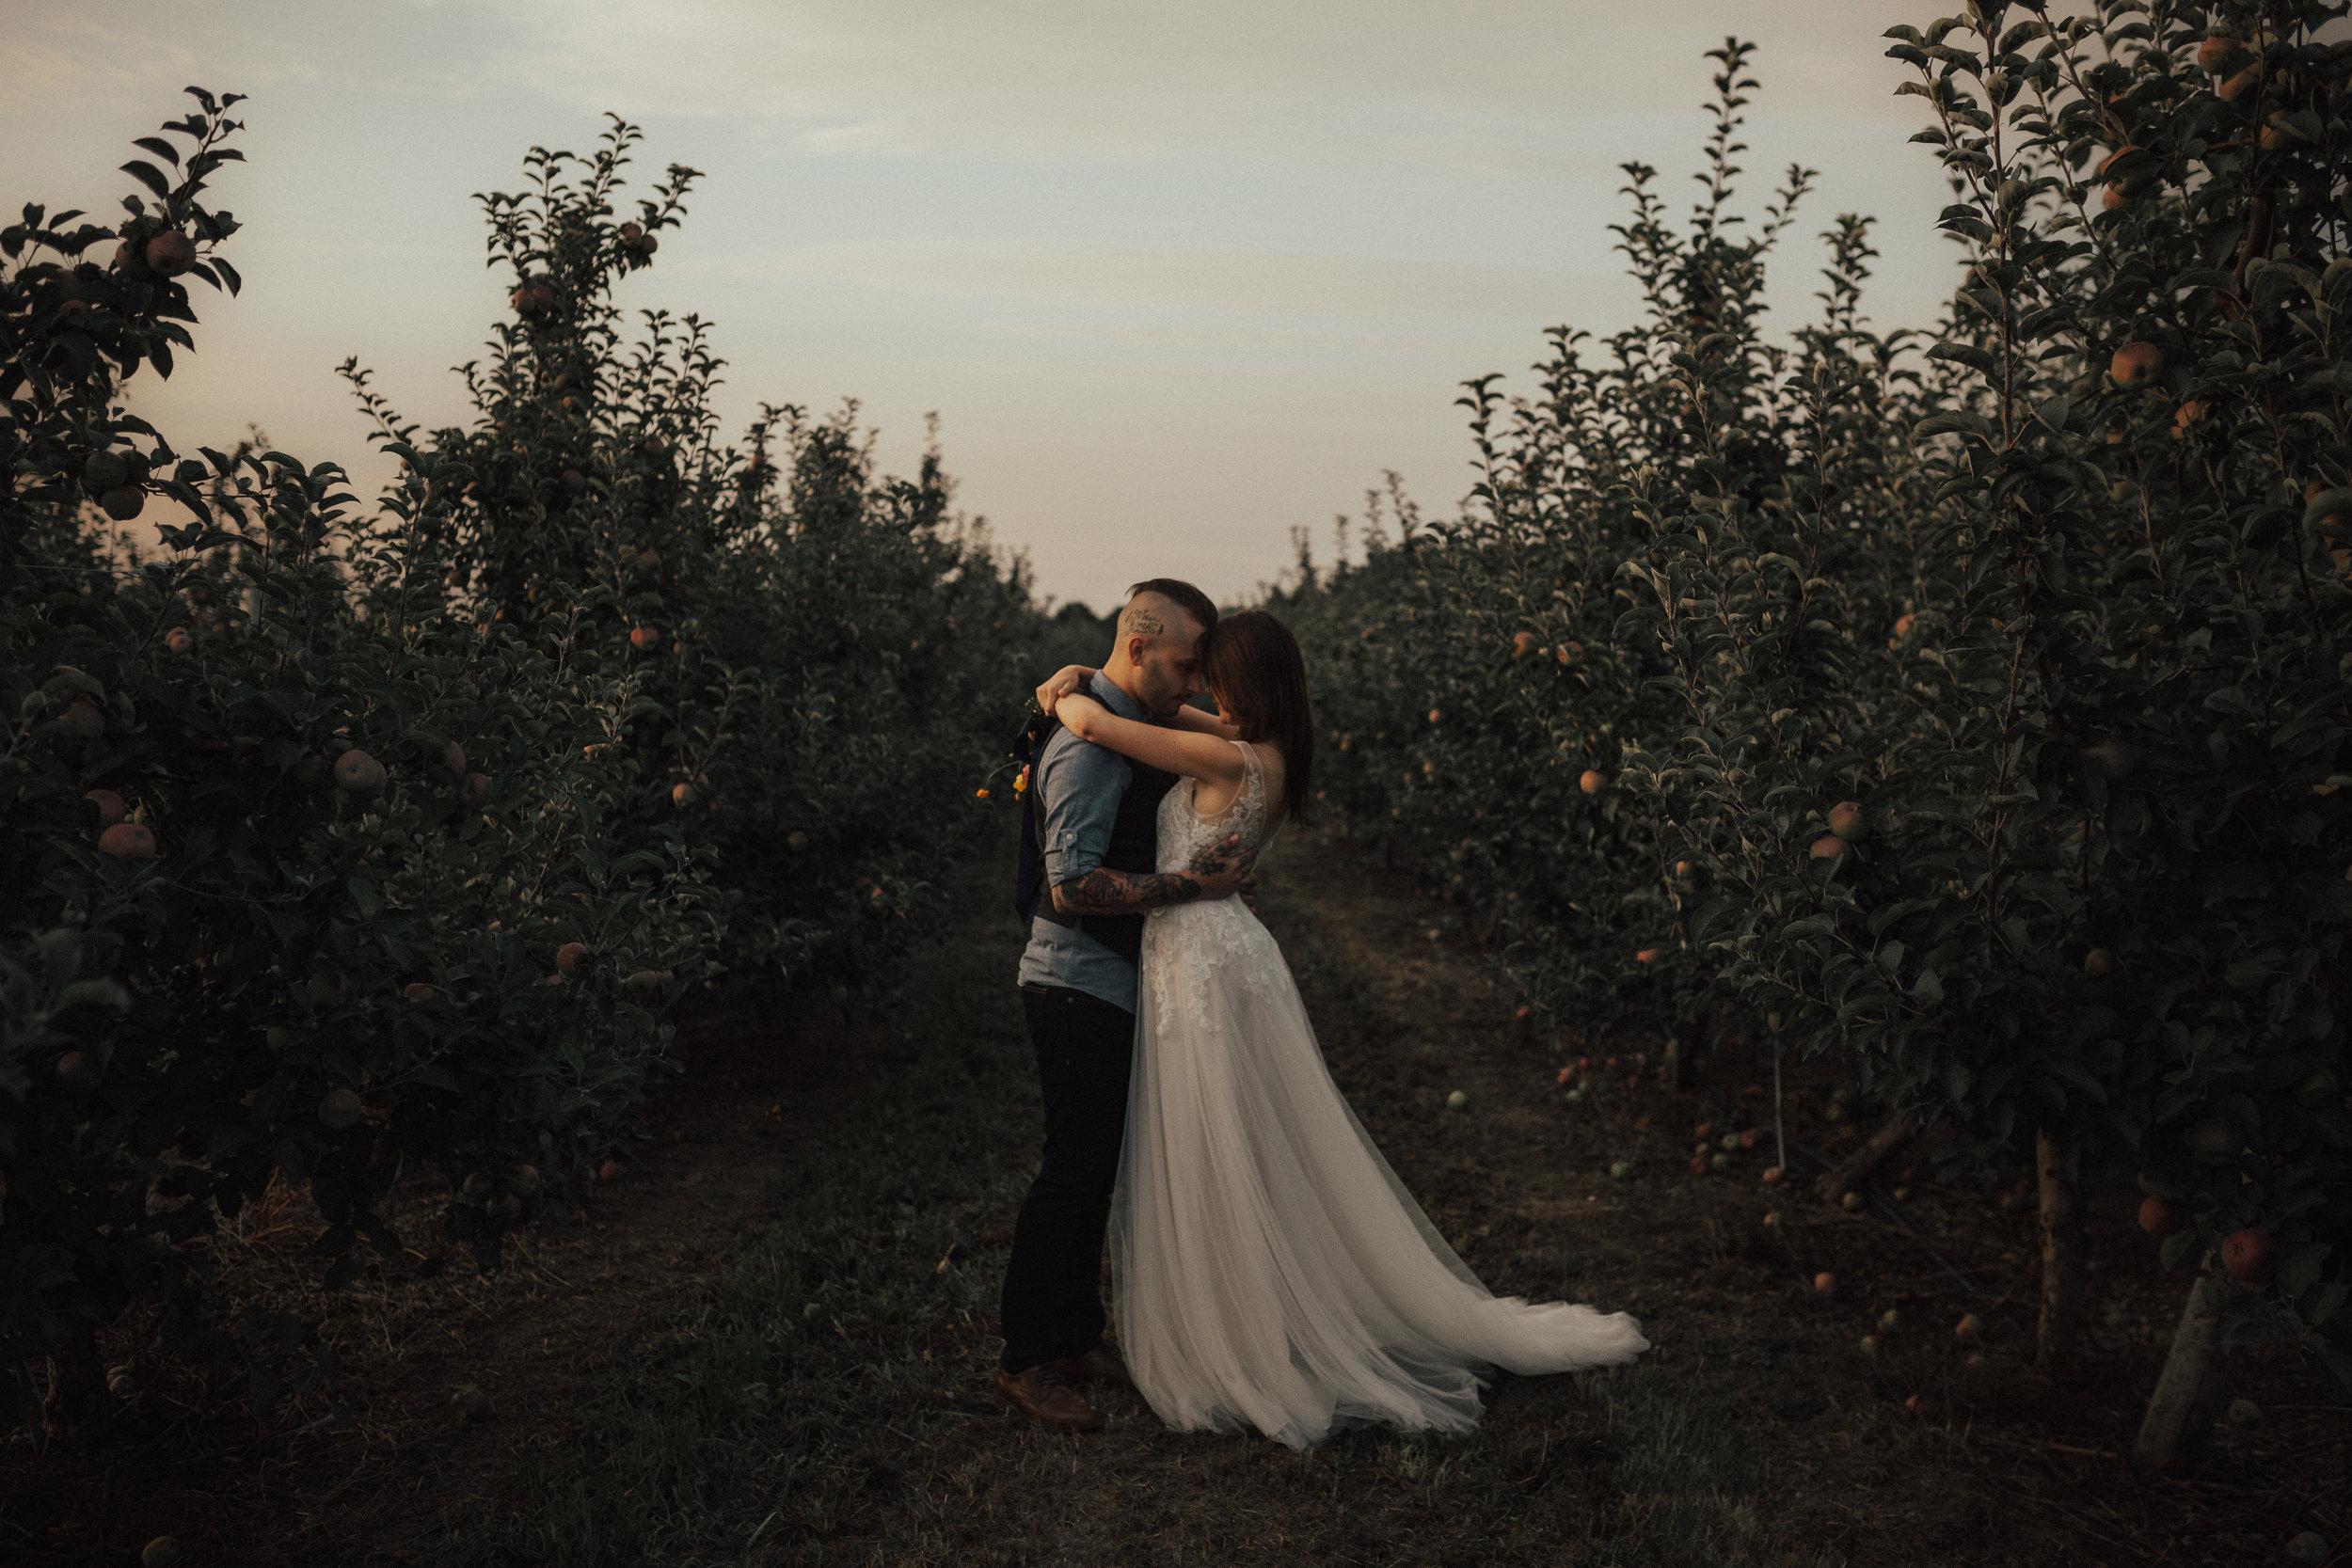 upstate_new_york_wedding_photos_0016.JPG